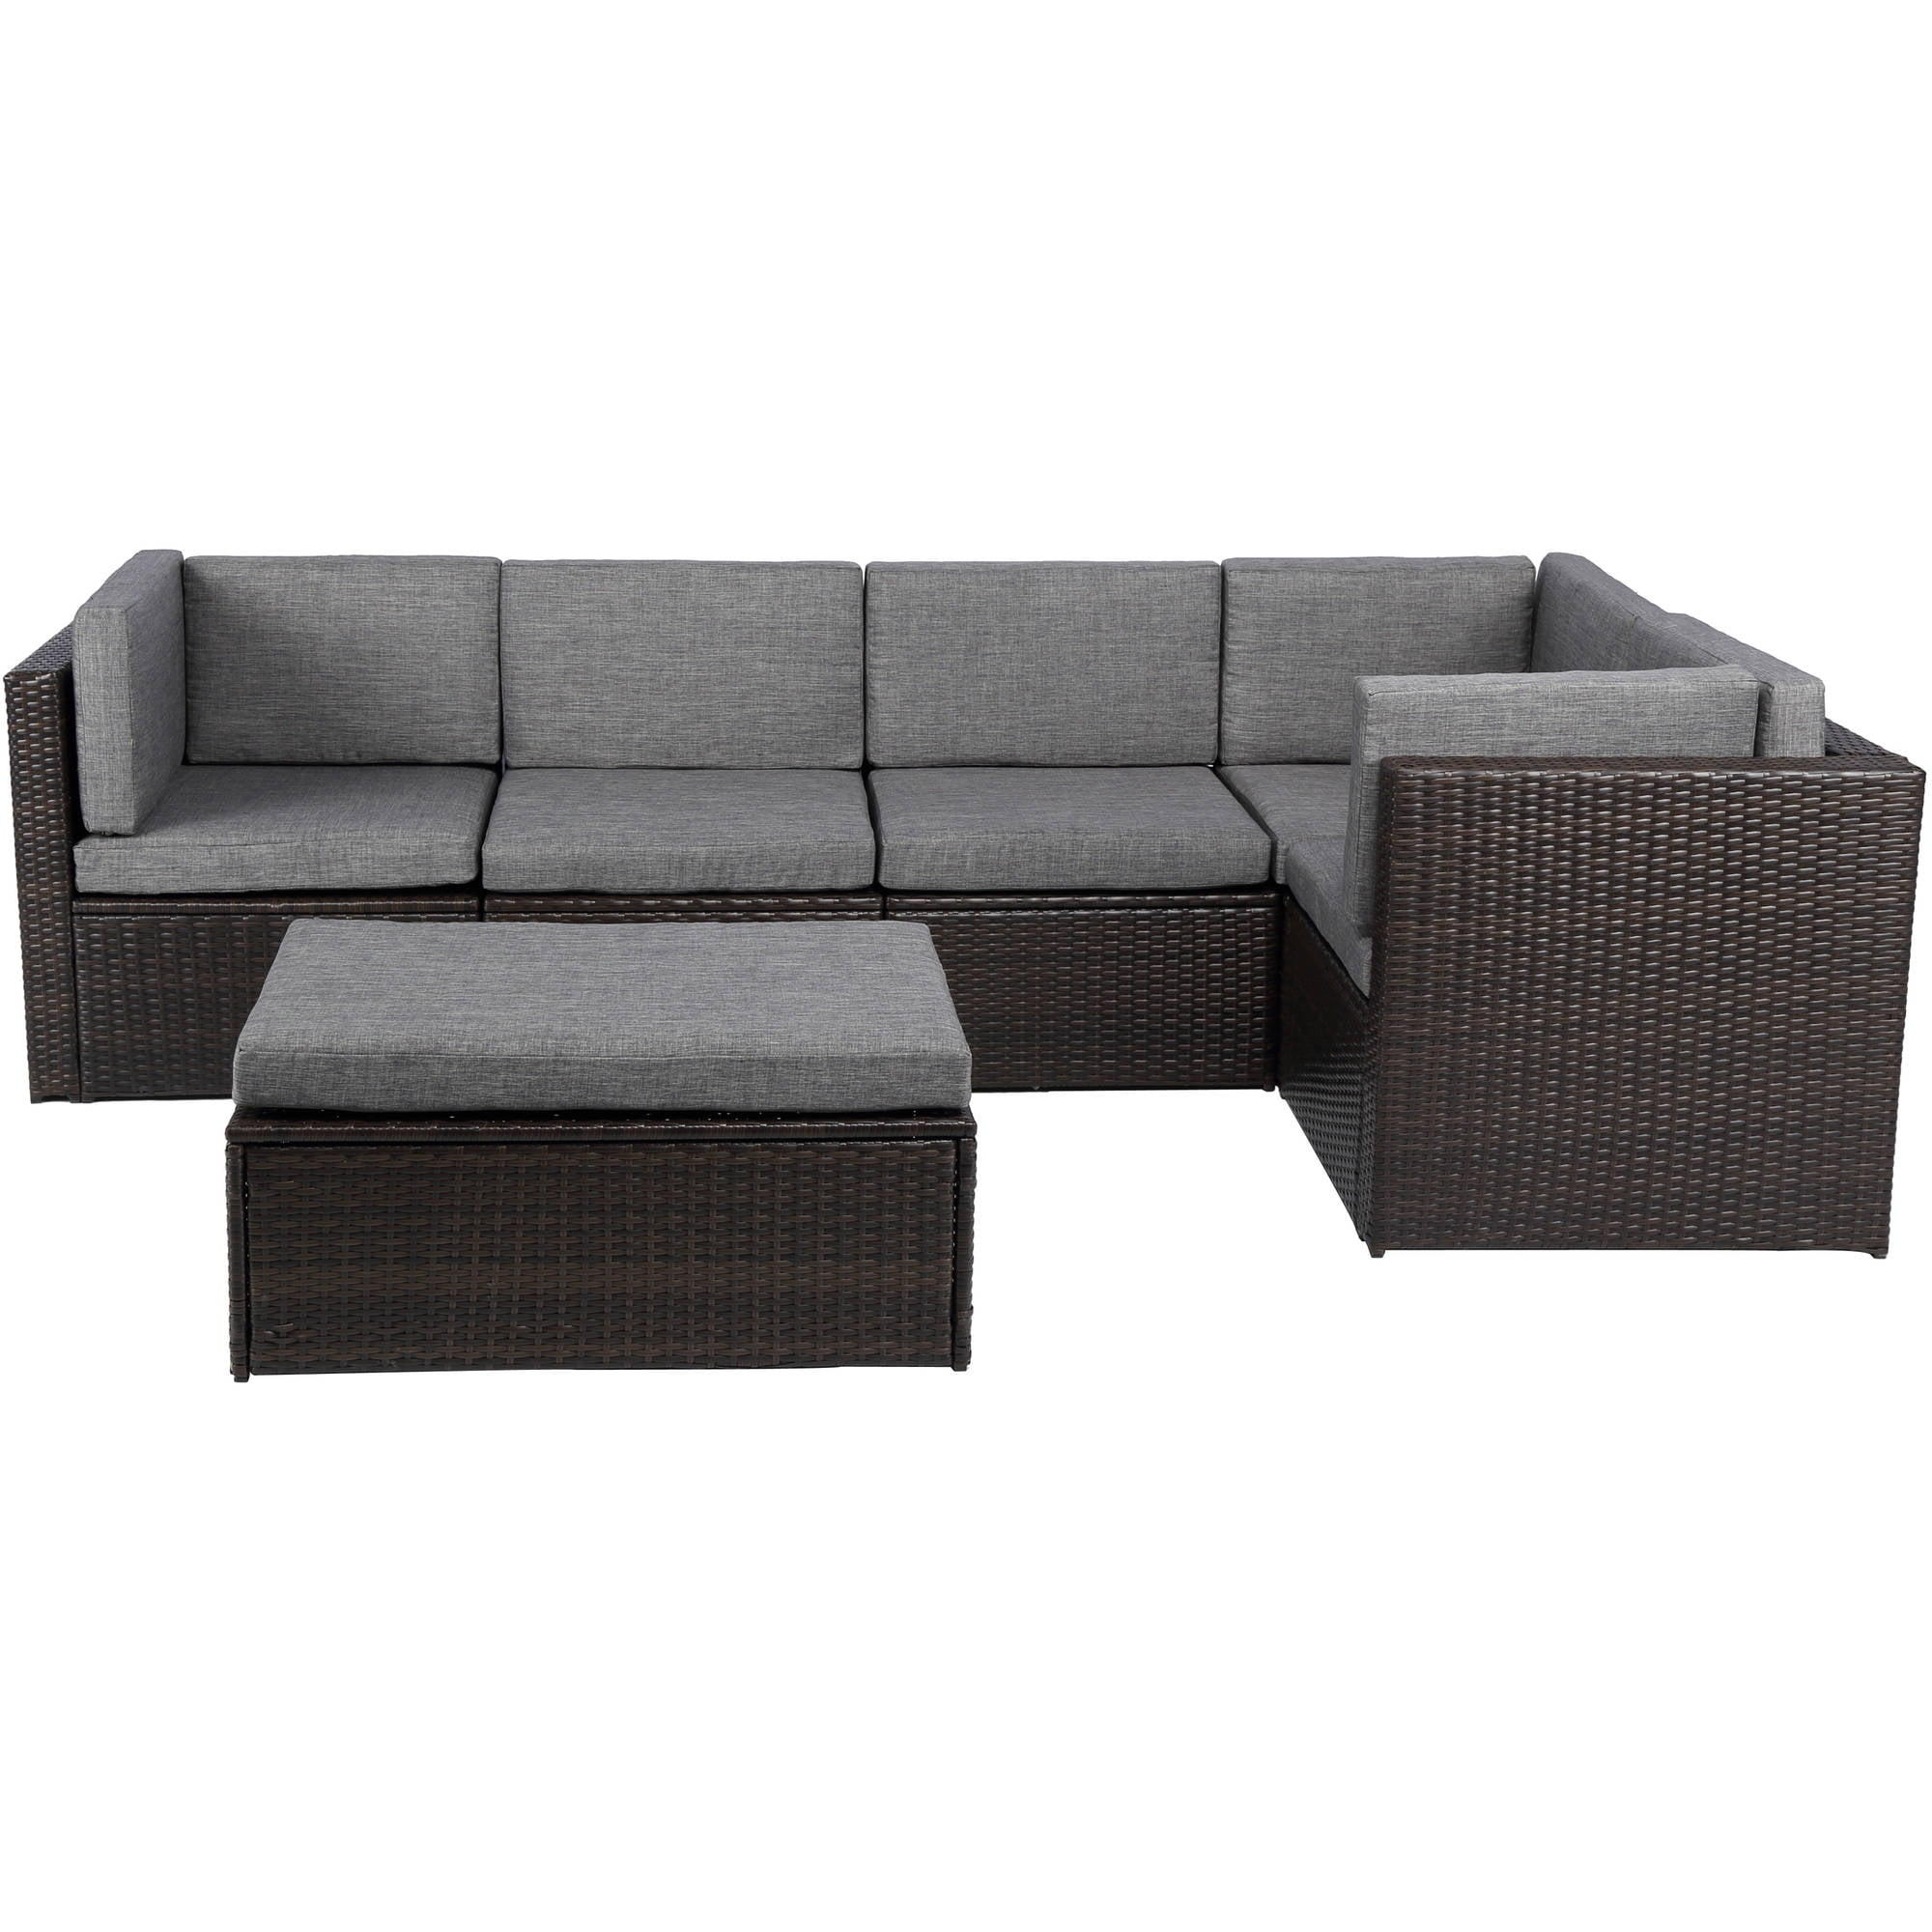 Baner Garden Outdoor Furniture Complete Patio PE Wicker Rattan Garden Corner Sofa Couch Set, Black, 4 Pieces by Caesar Hardware